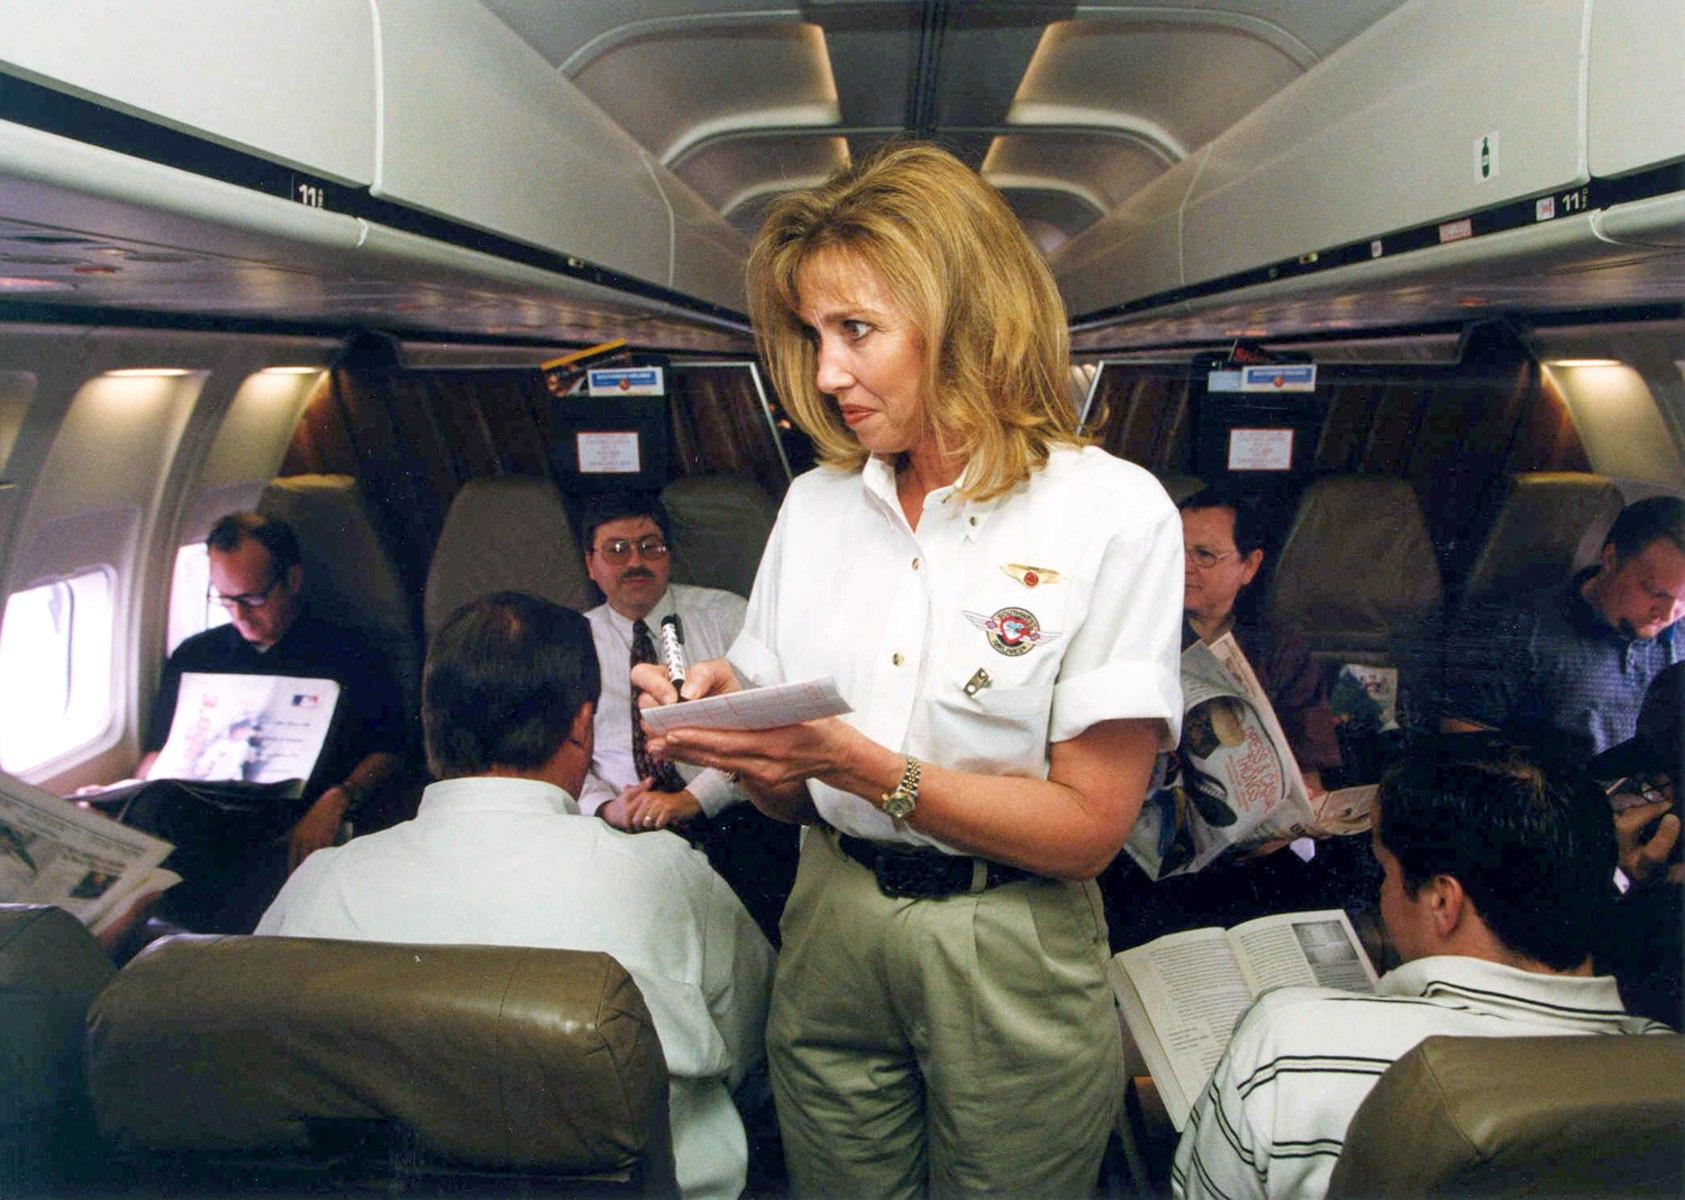 british airway female flight win uniform battle to wear pants style